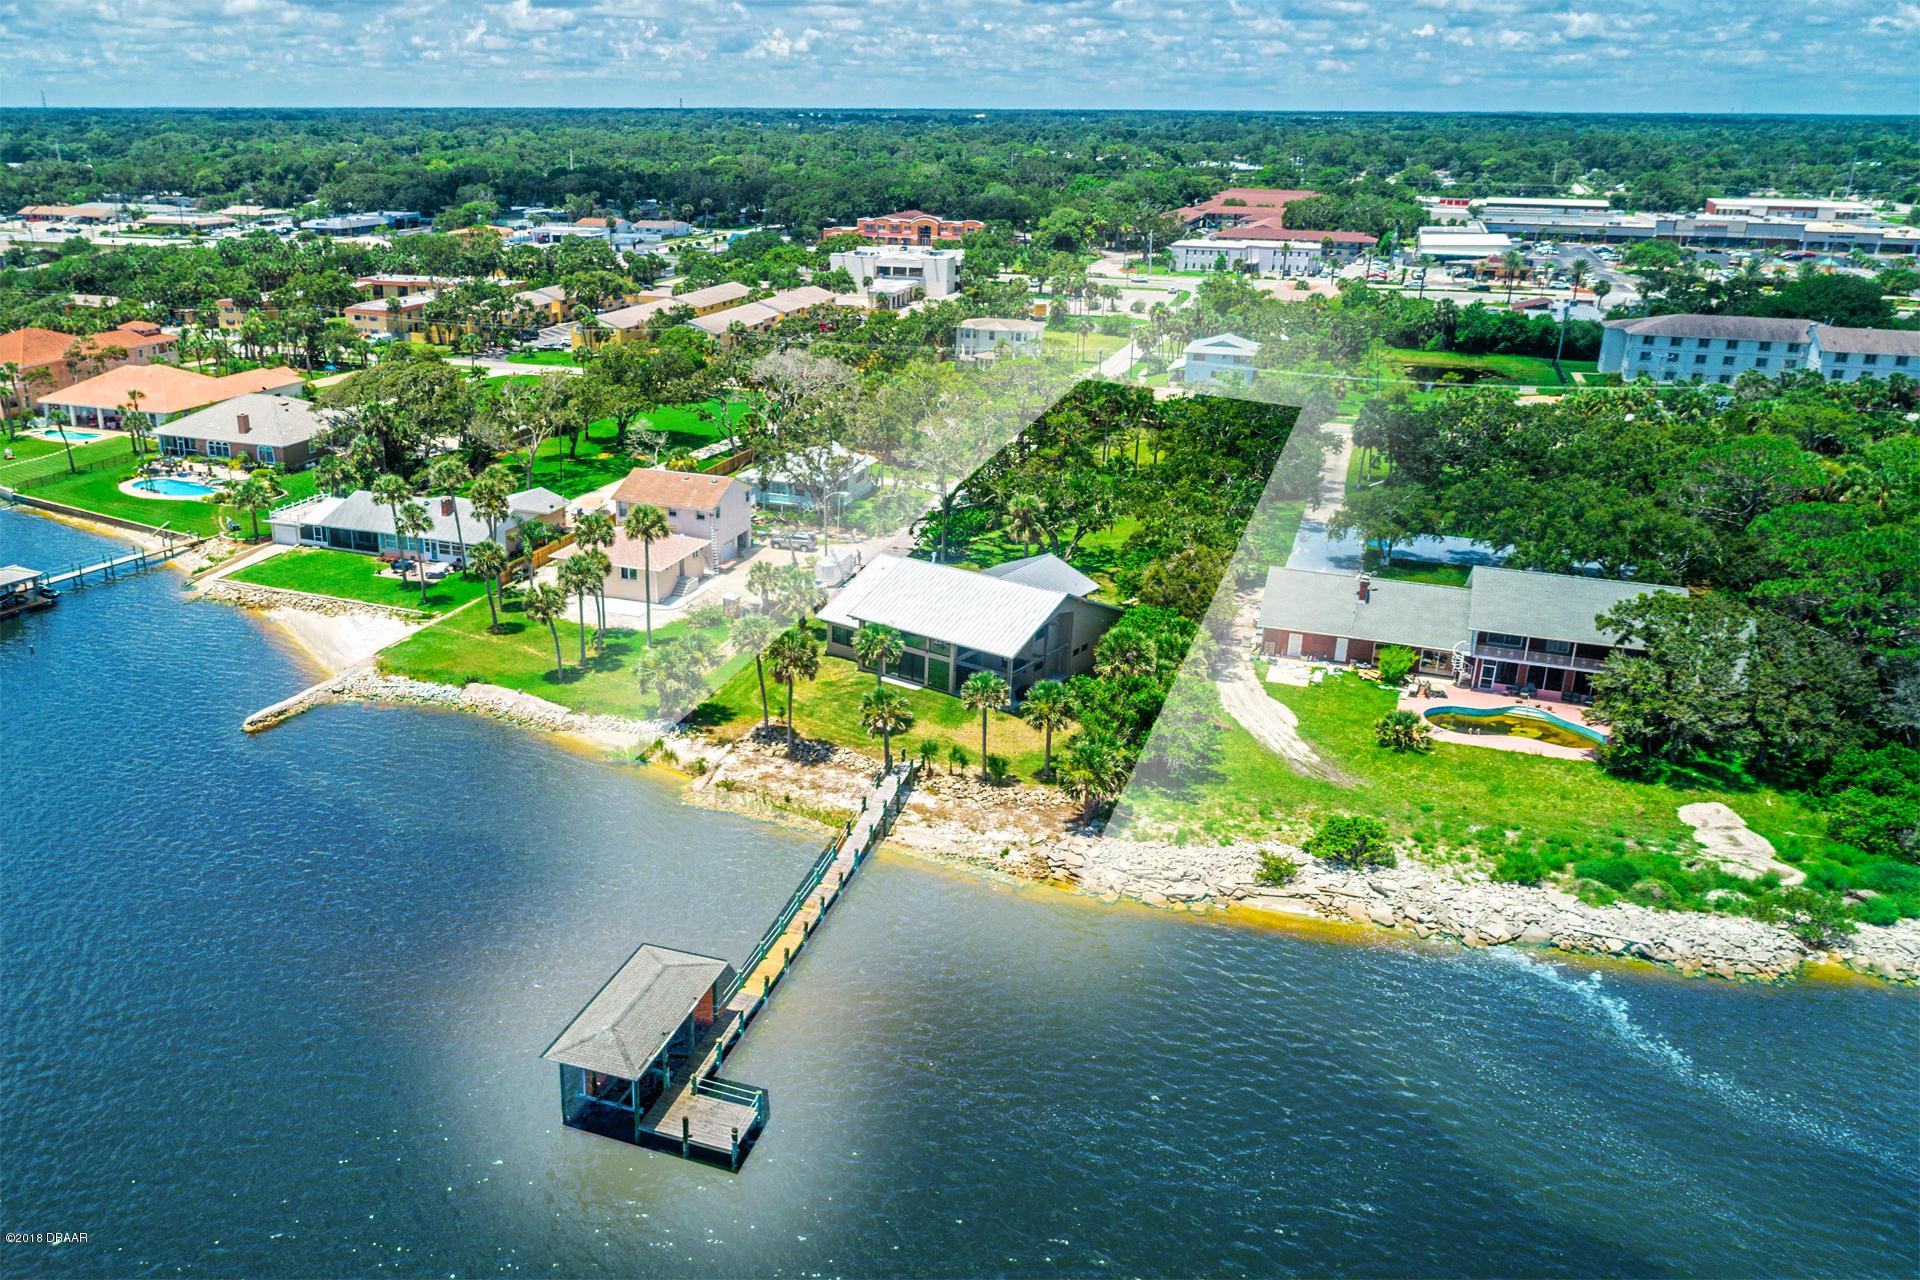 102 Mcdonald St, South Daytona, Florida